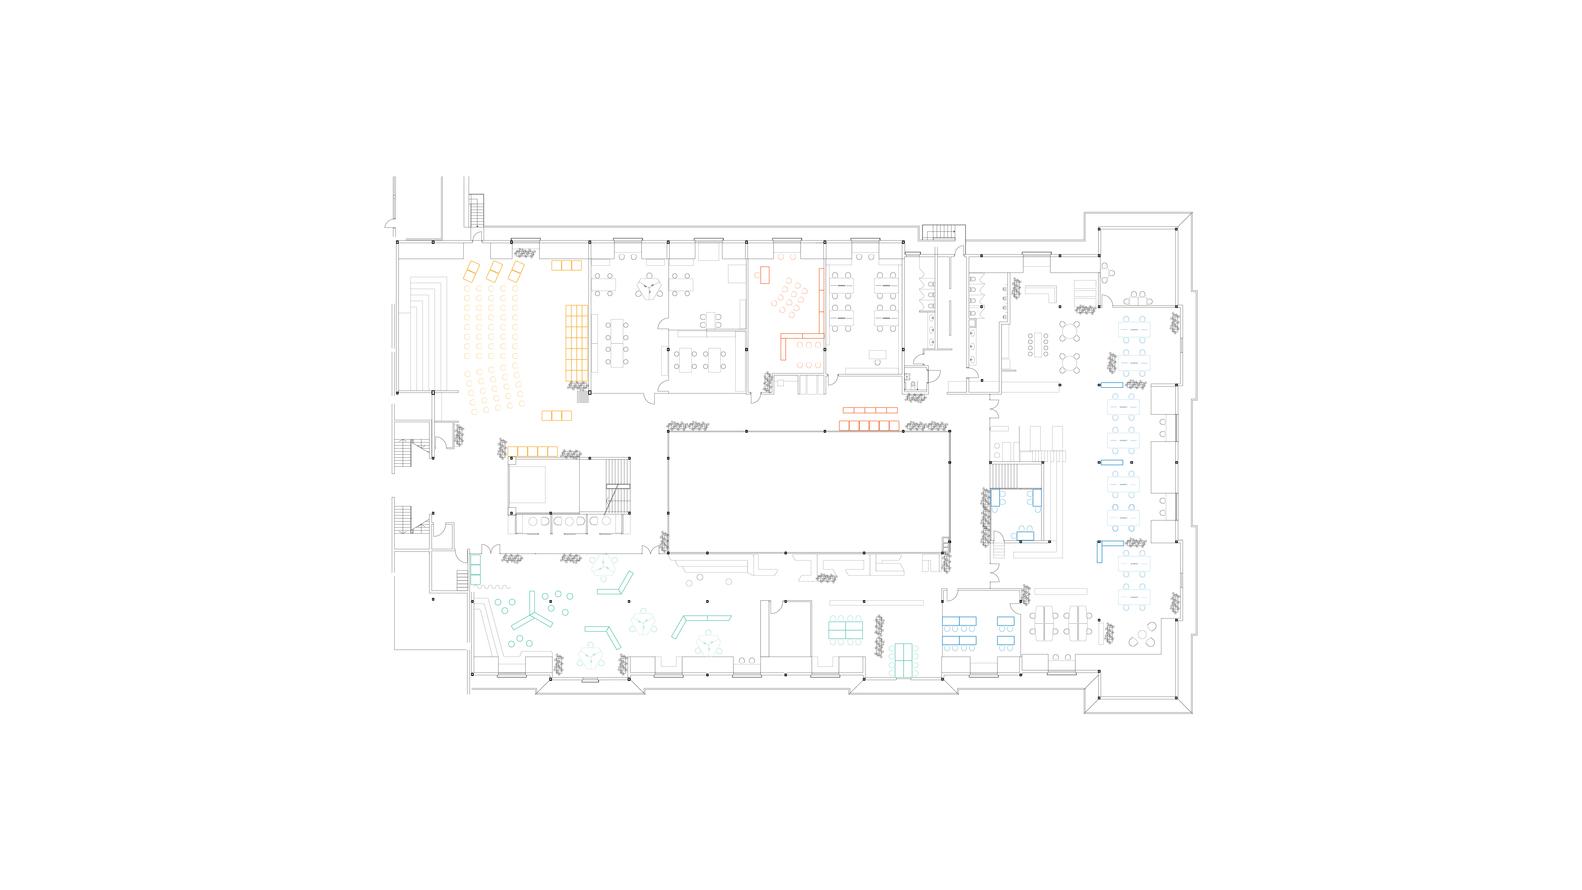 medium resolution of private sezin school open roof space floor plan